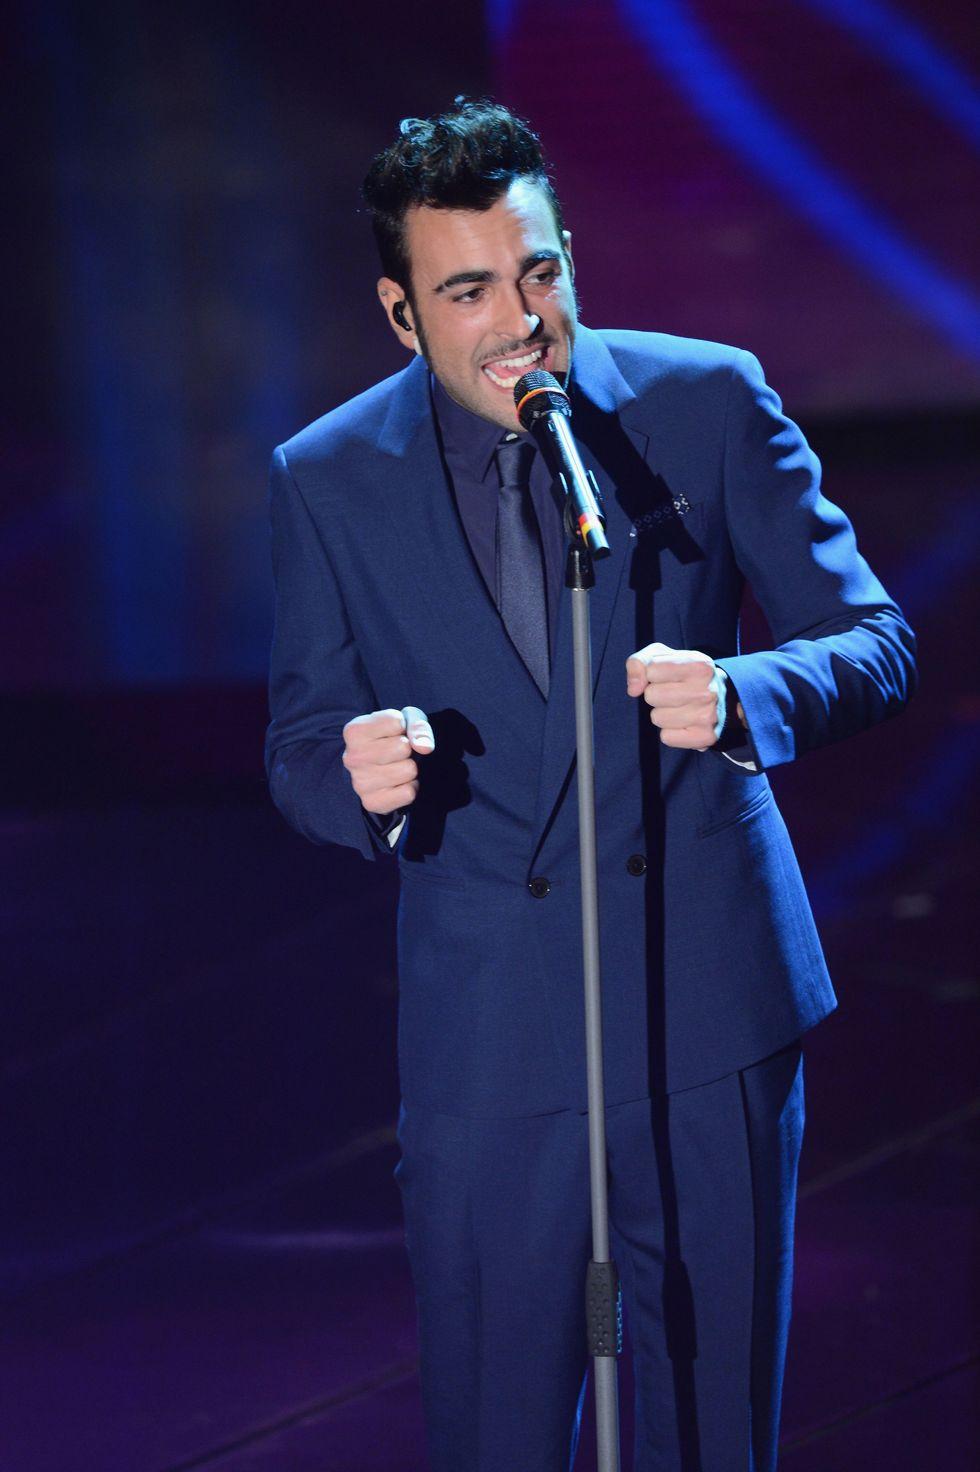 Sanremo 2013: vince Marco Mengoni. Le pagelle della finale